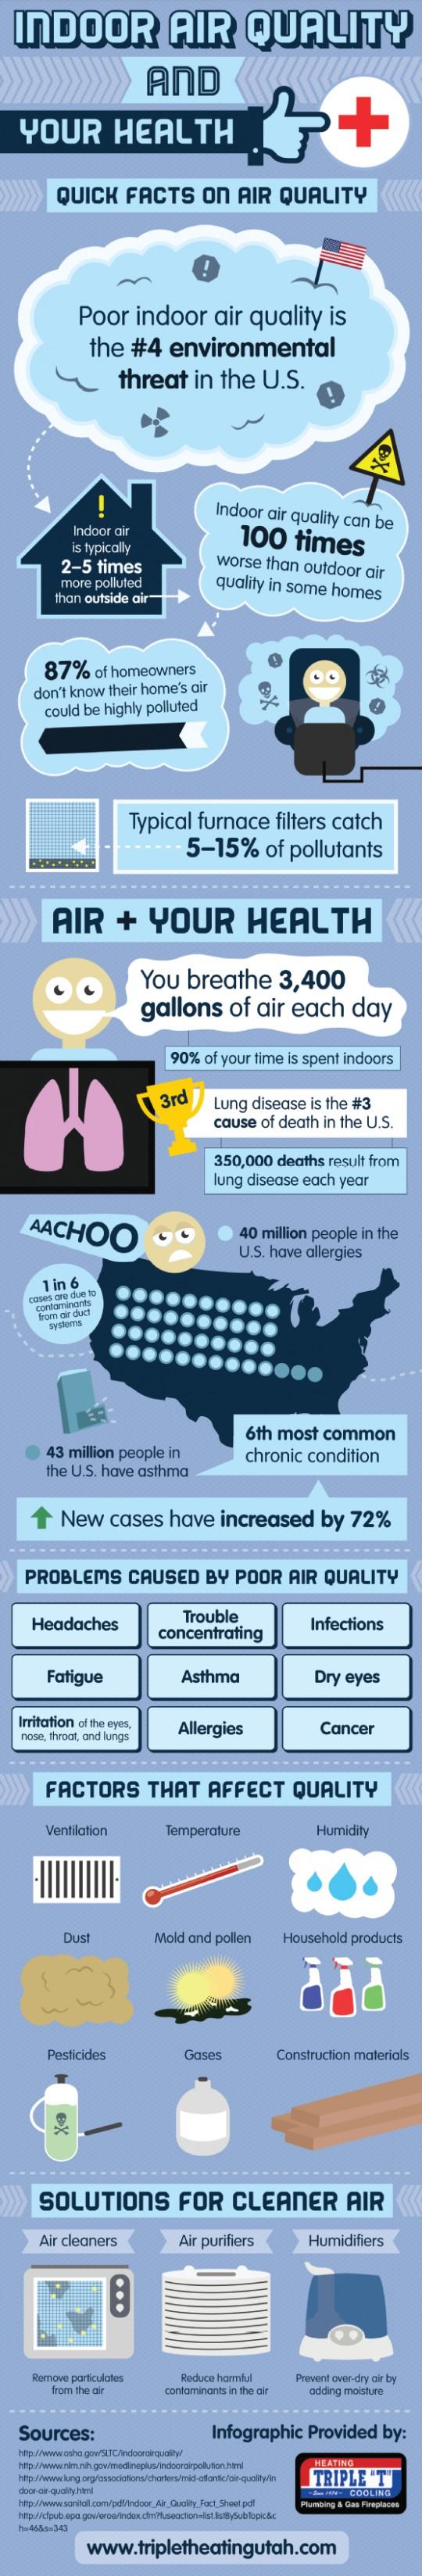 IAQ, indoor air quality, air quality, ventilation, HVAC